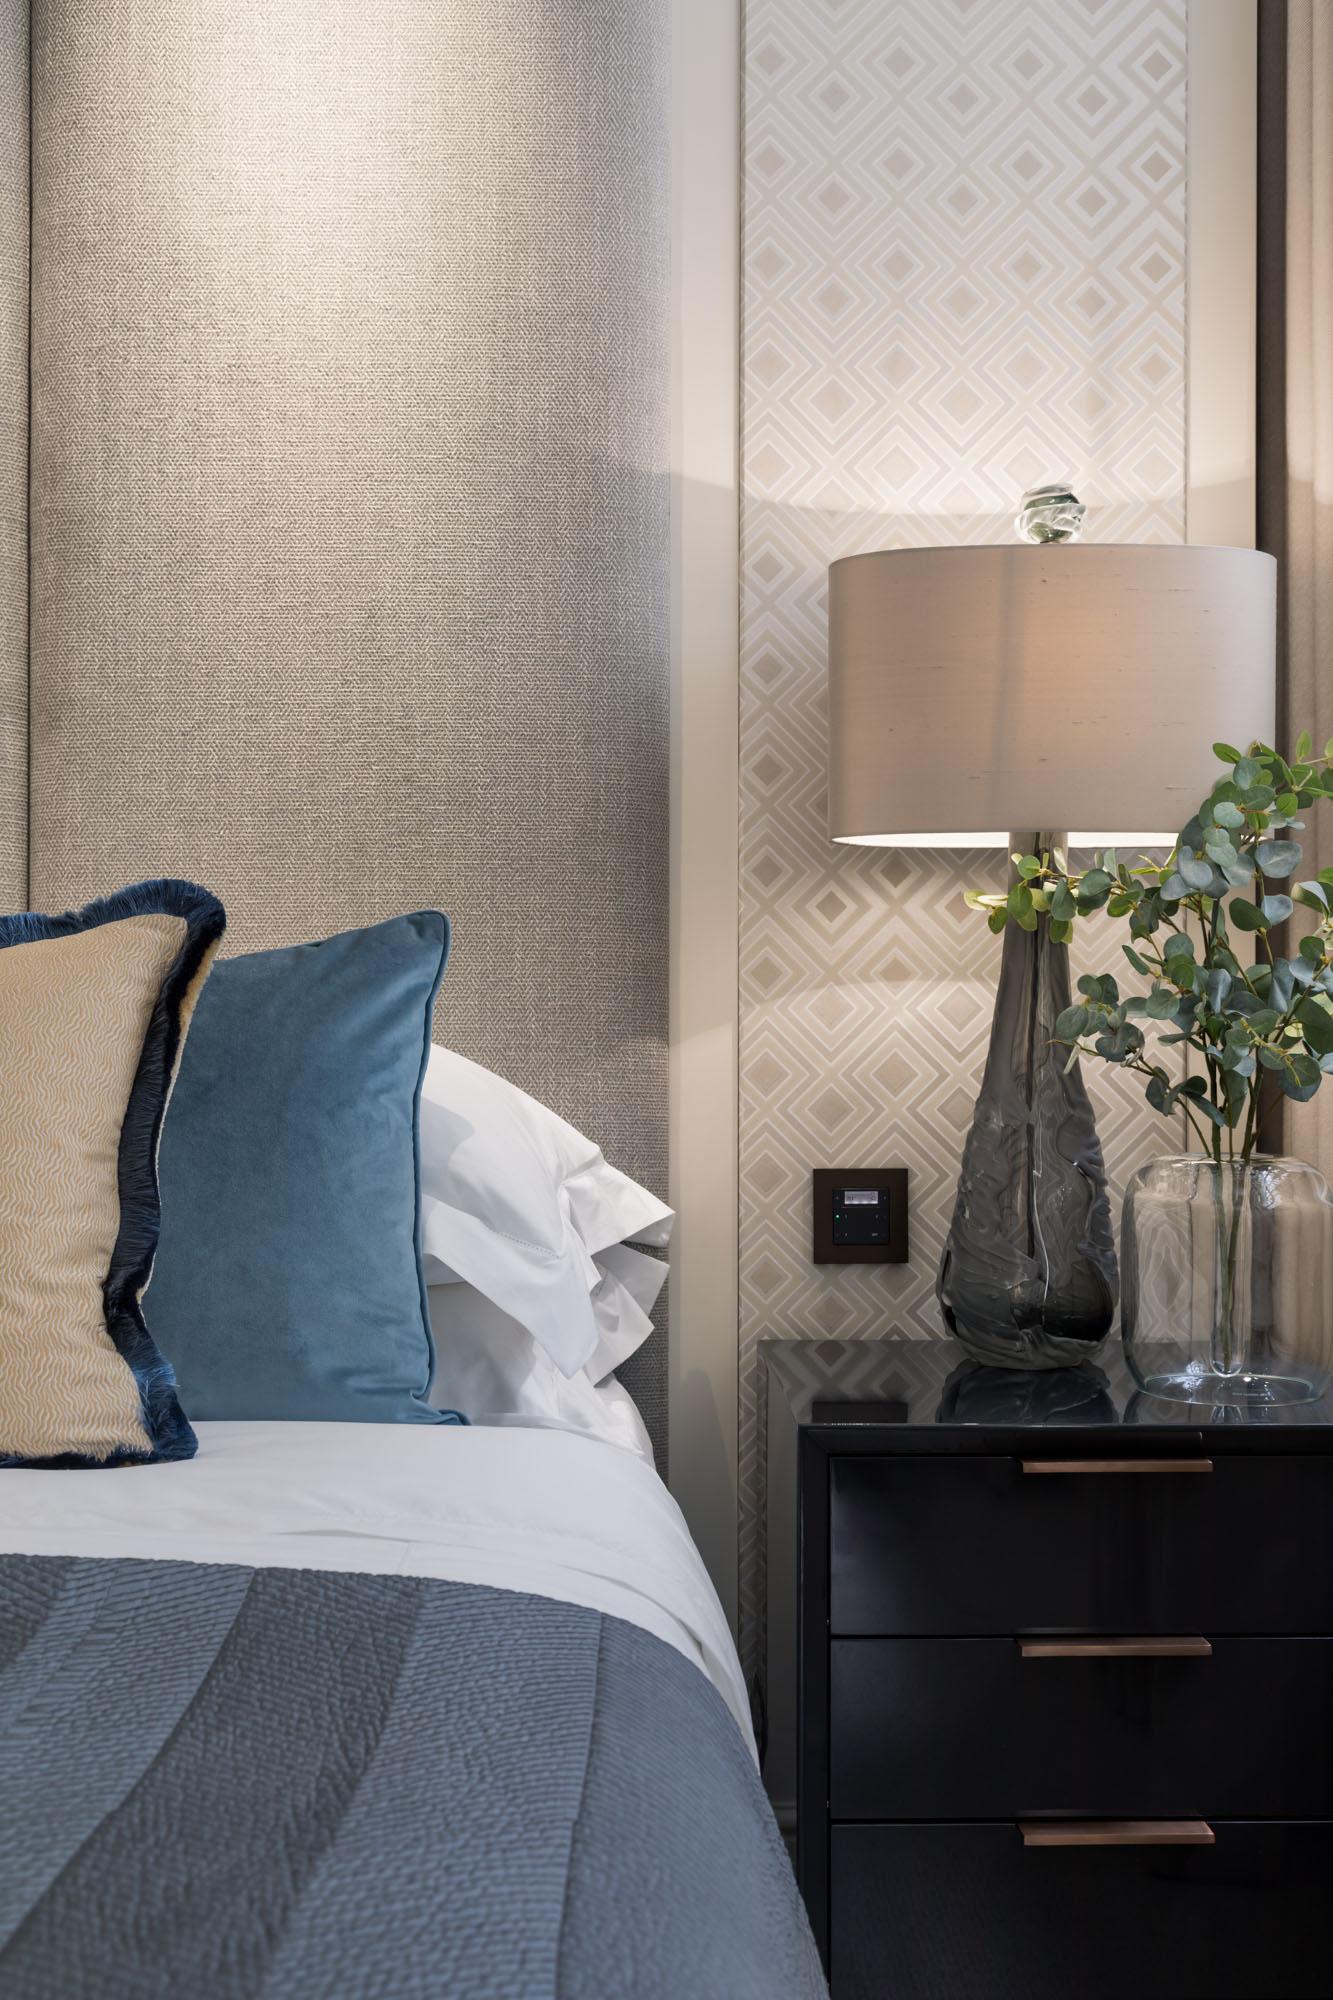 jonathan bond, interior photographer, bedside lamp, chelsea, london